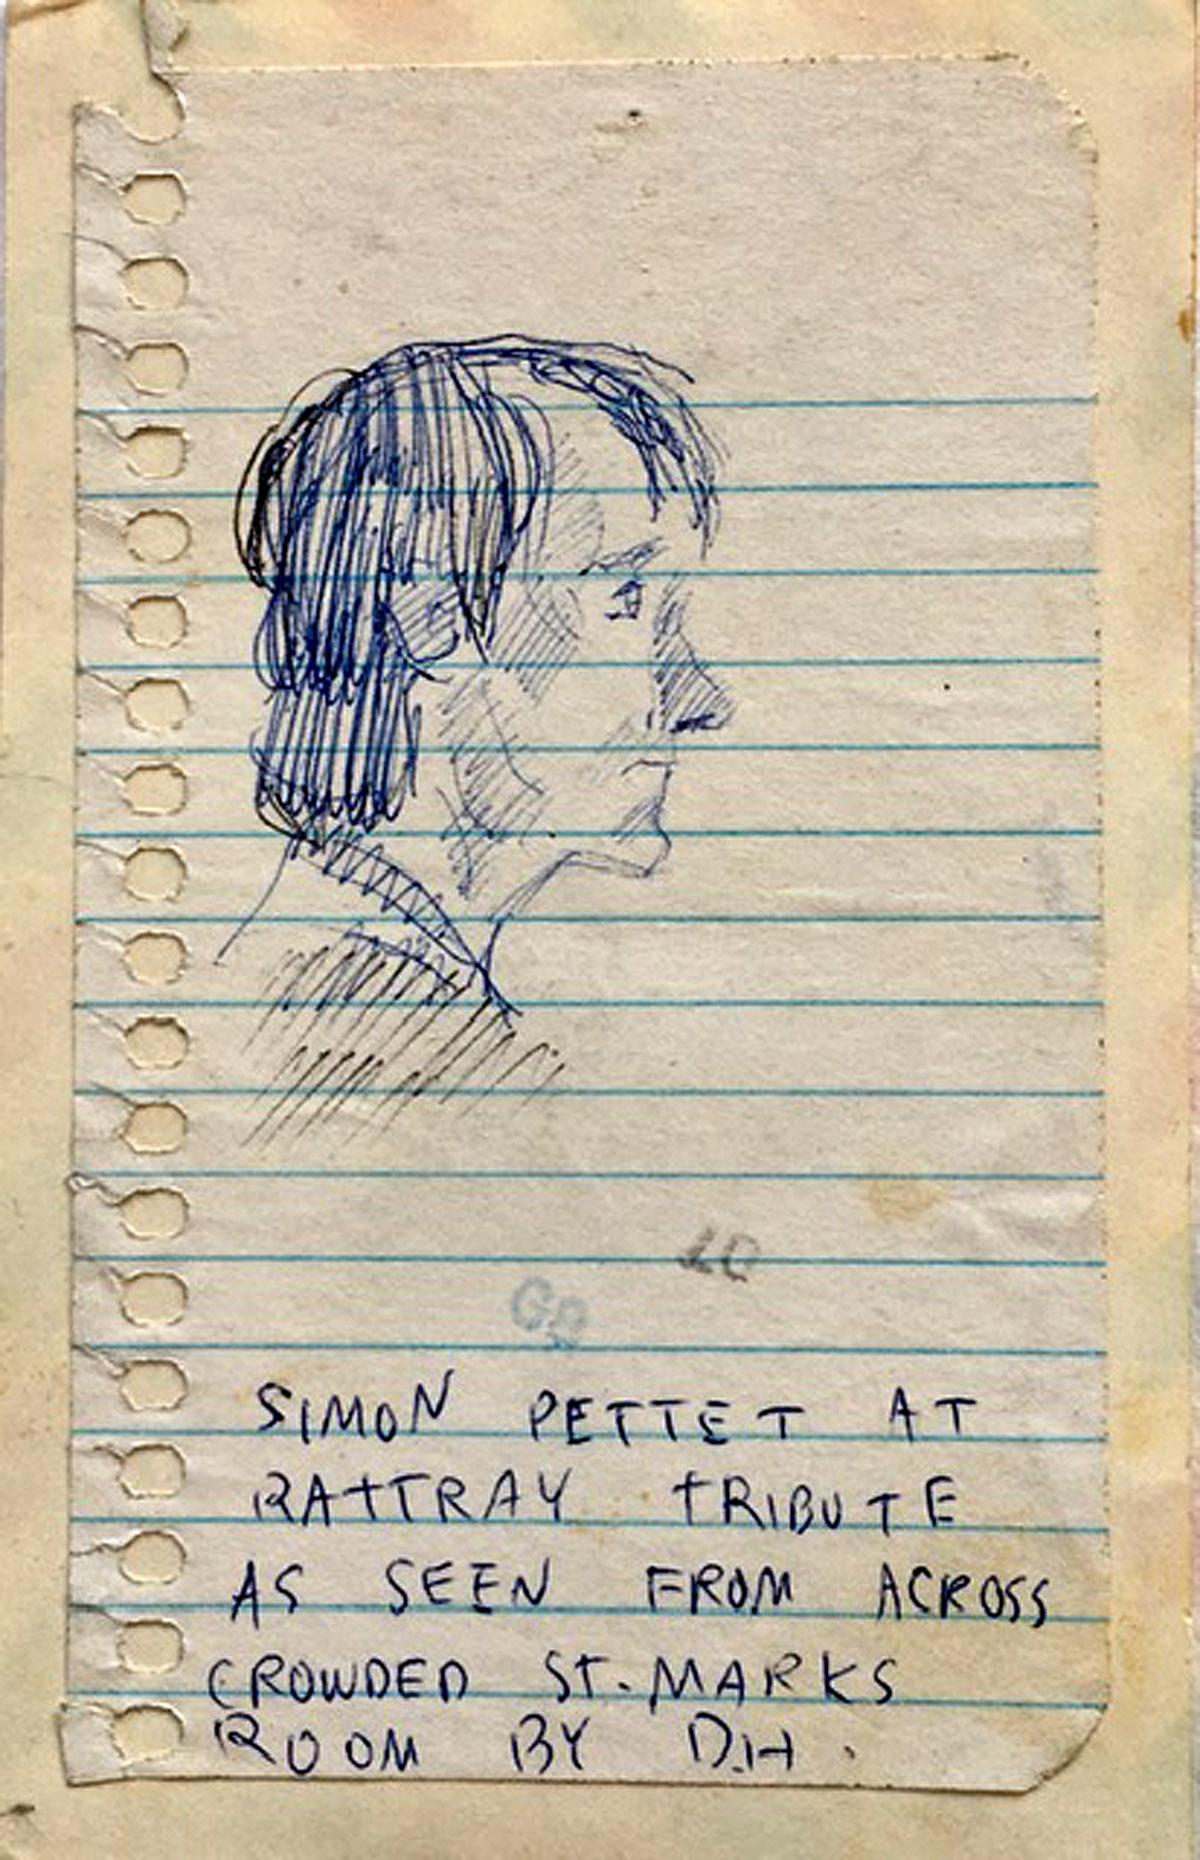 Sketch by Duncan Hannah